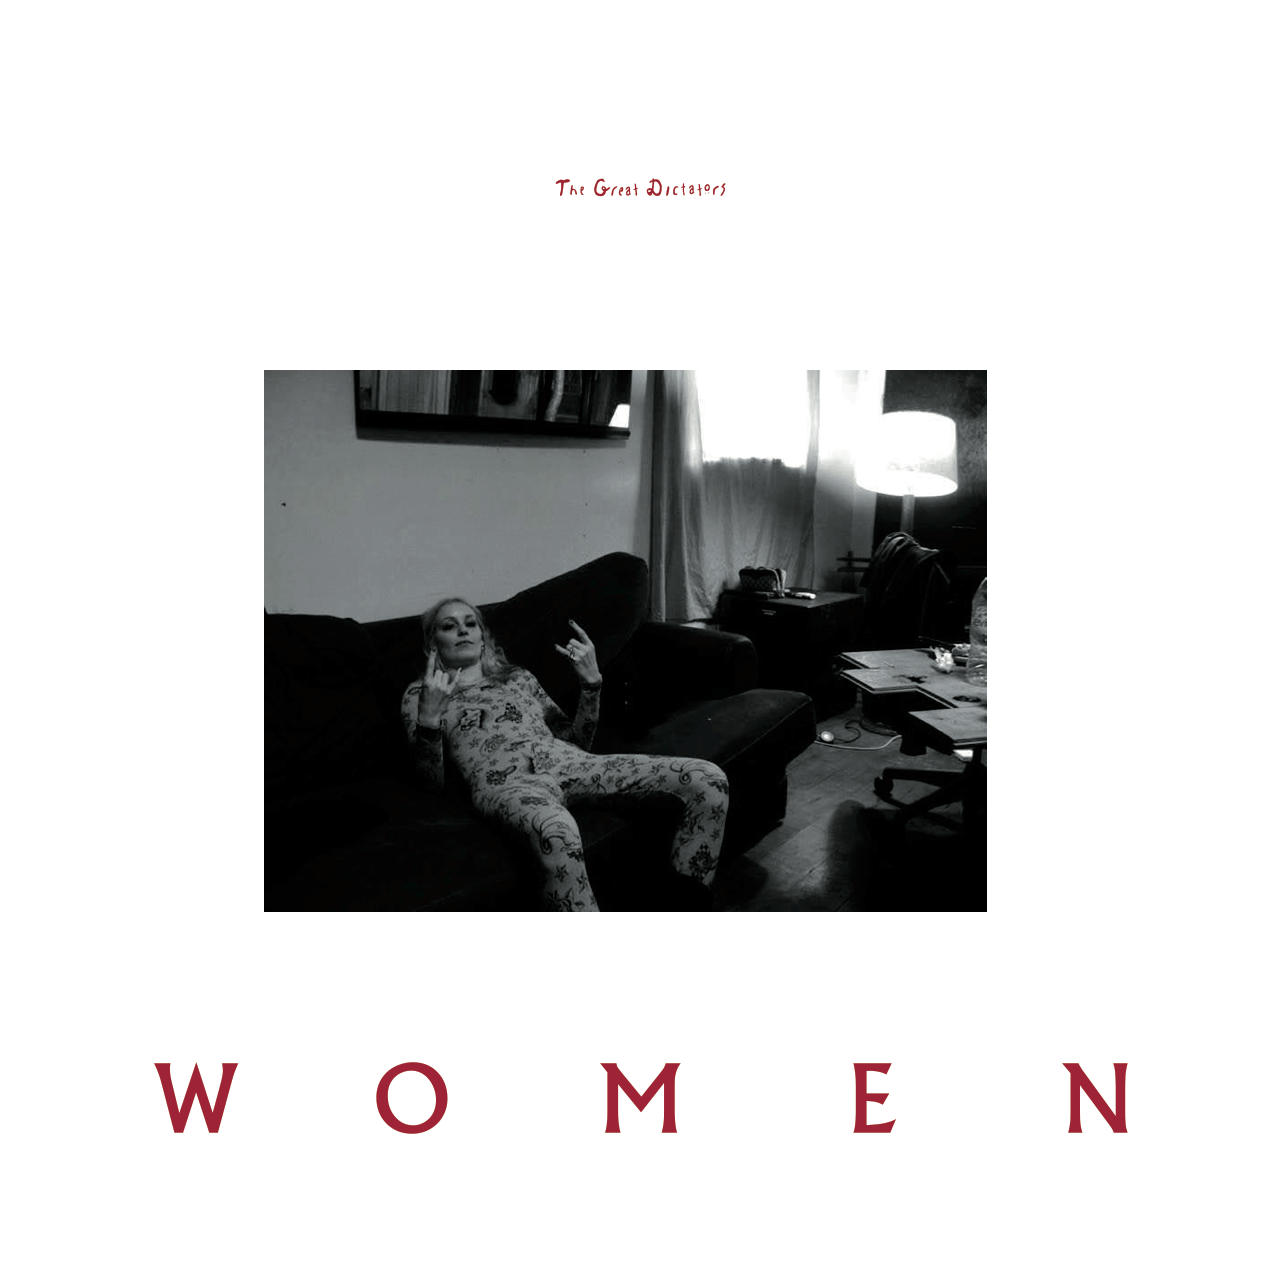 The Great Dictators - Women (Album)